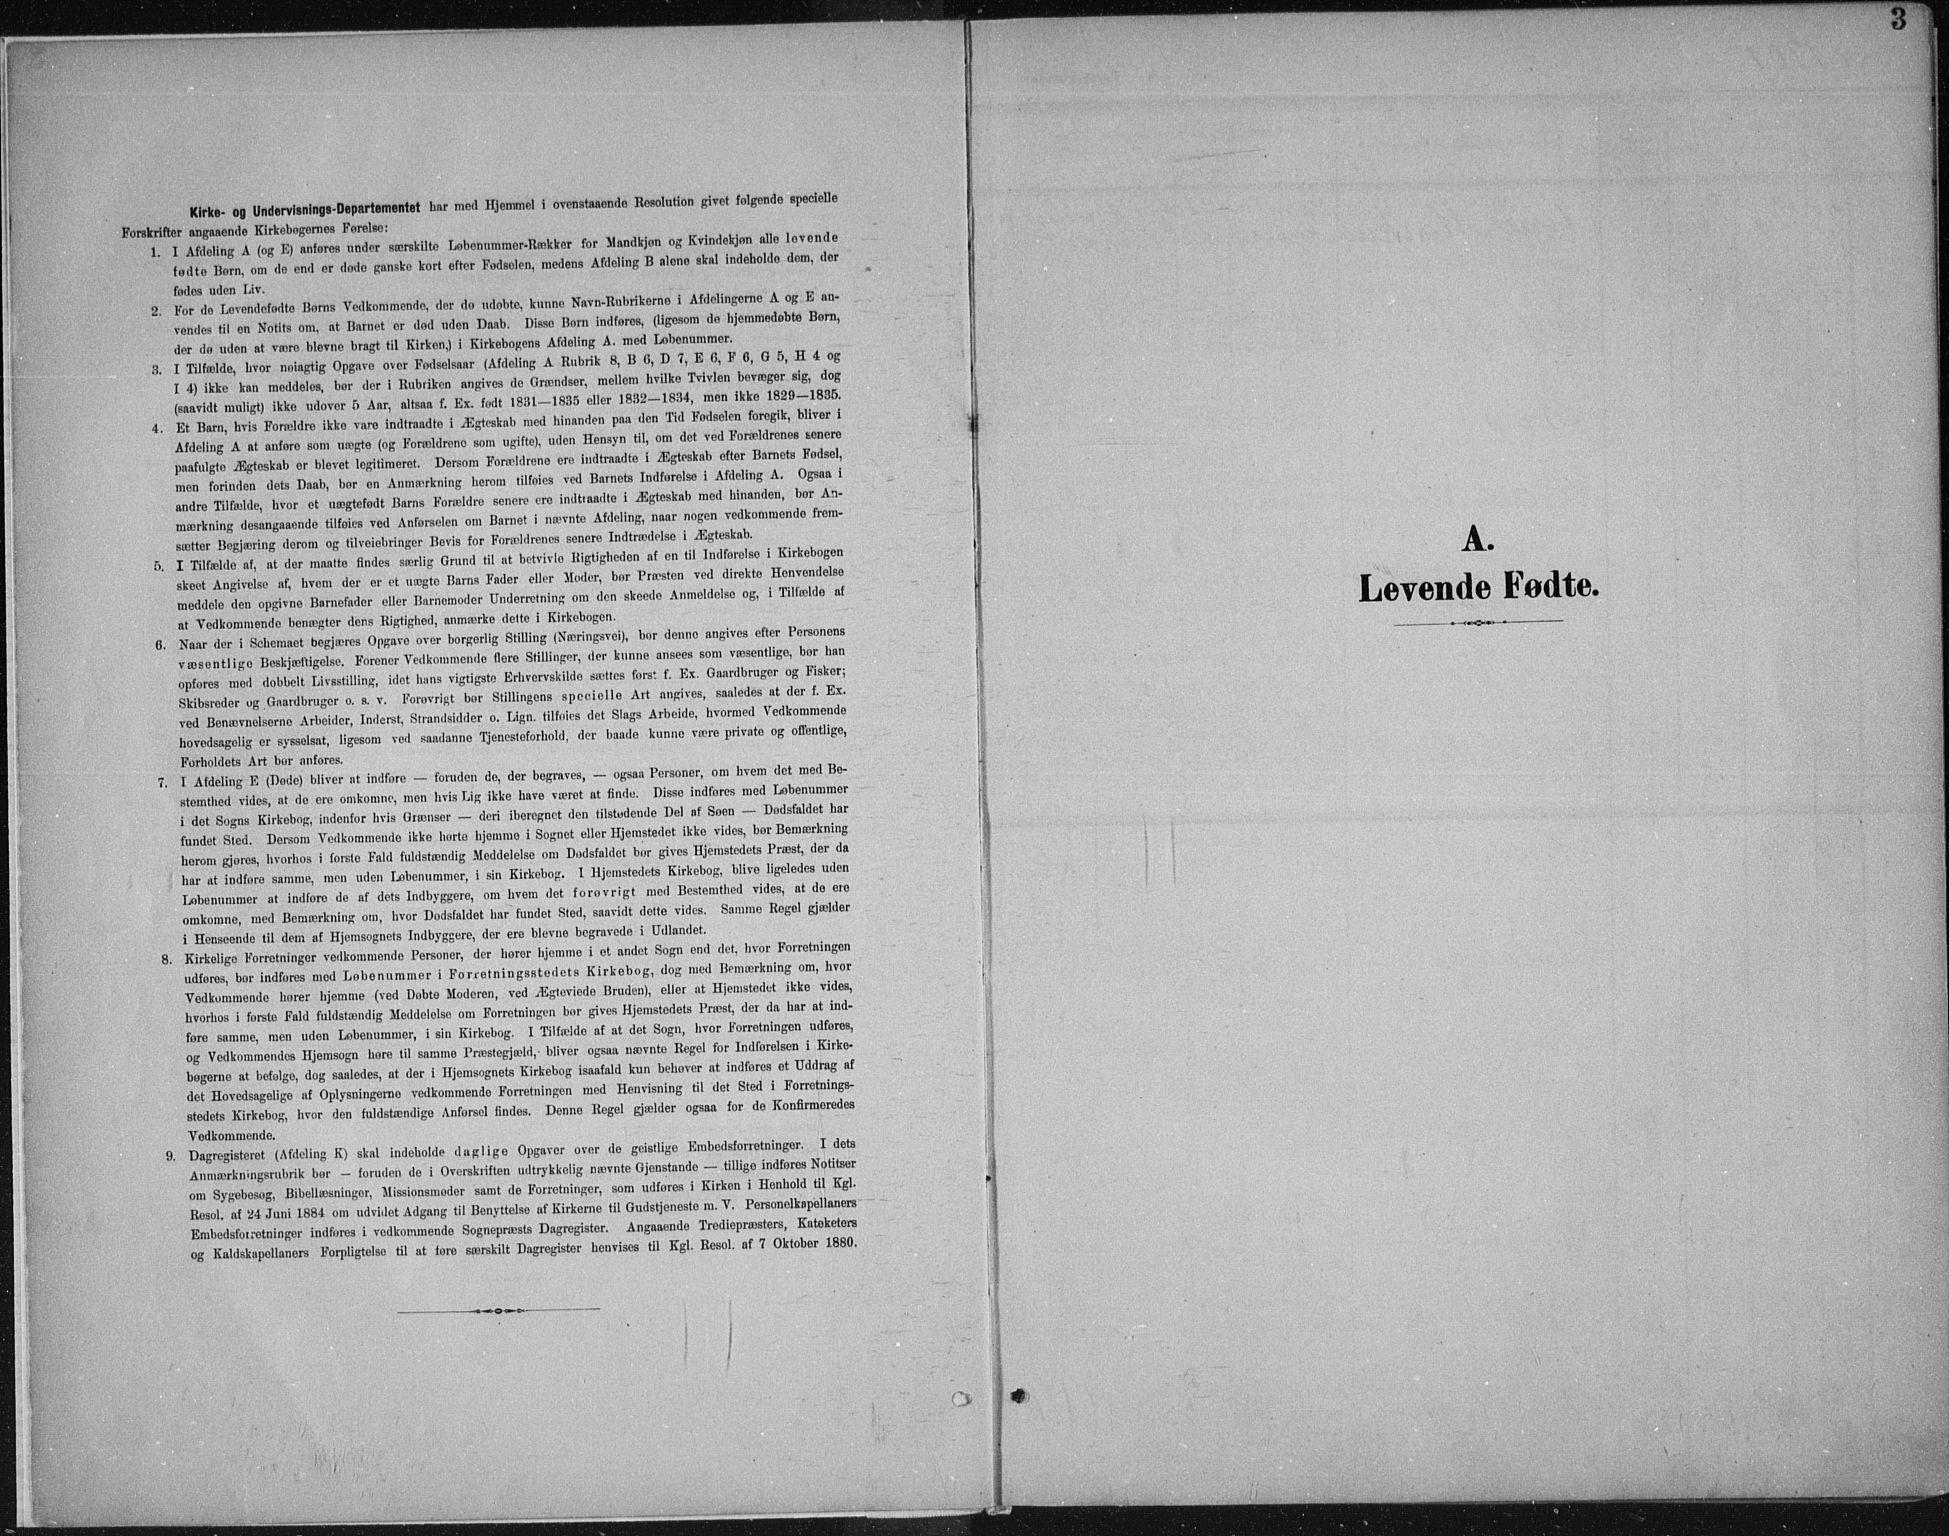 SAH, Vardal prestekontor, H/Ha/Haa/L0013: Ministerialbok nr. 13, 1901-1911, s. 3